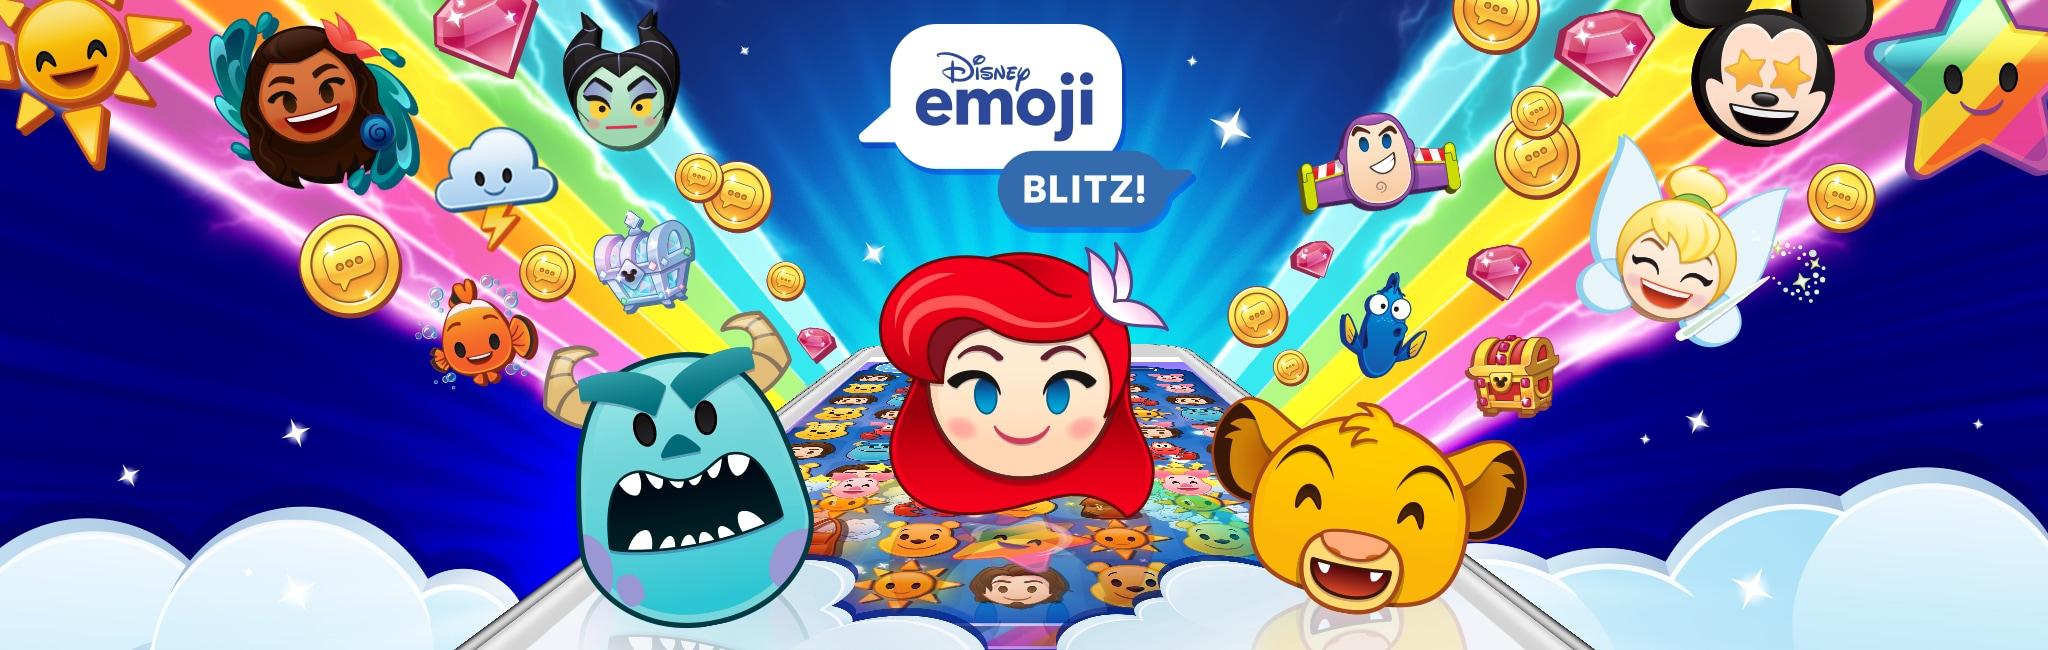 Disney: Disney Emoji Blitz Kingdom Hearts regarding Disney Emoji Blitz Event Calendar